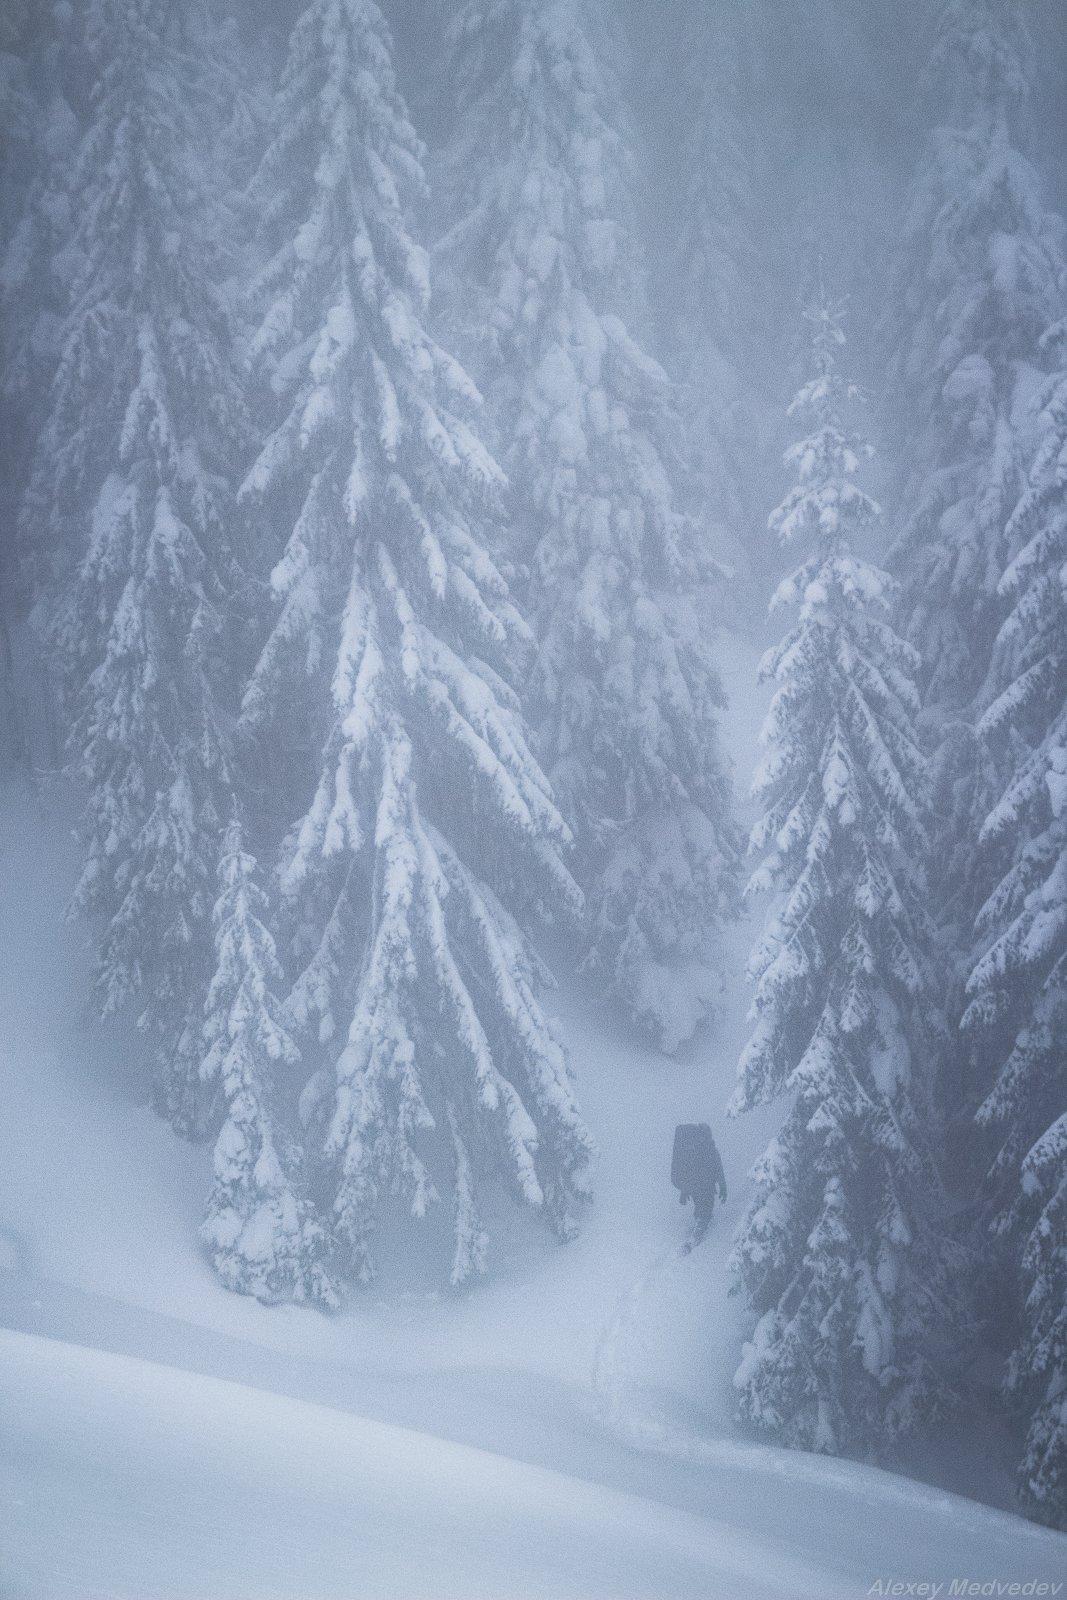 winter, cold, hut, house, forest, carpathains, man, Алексей Медведев